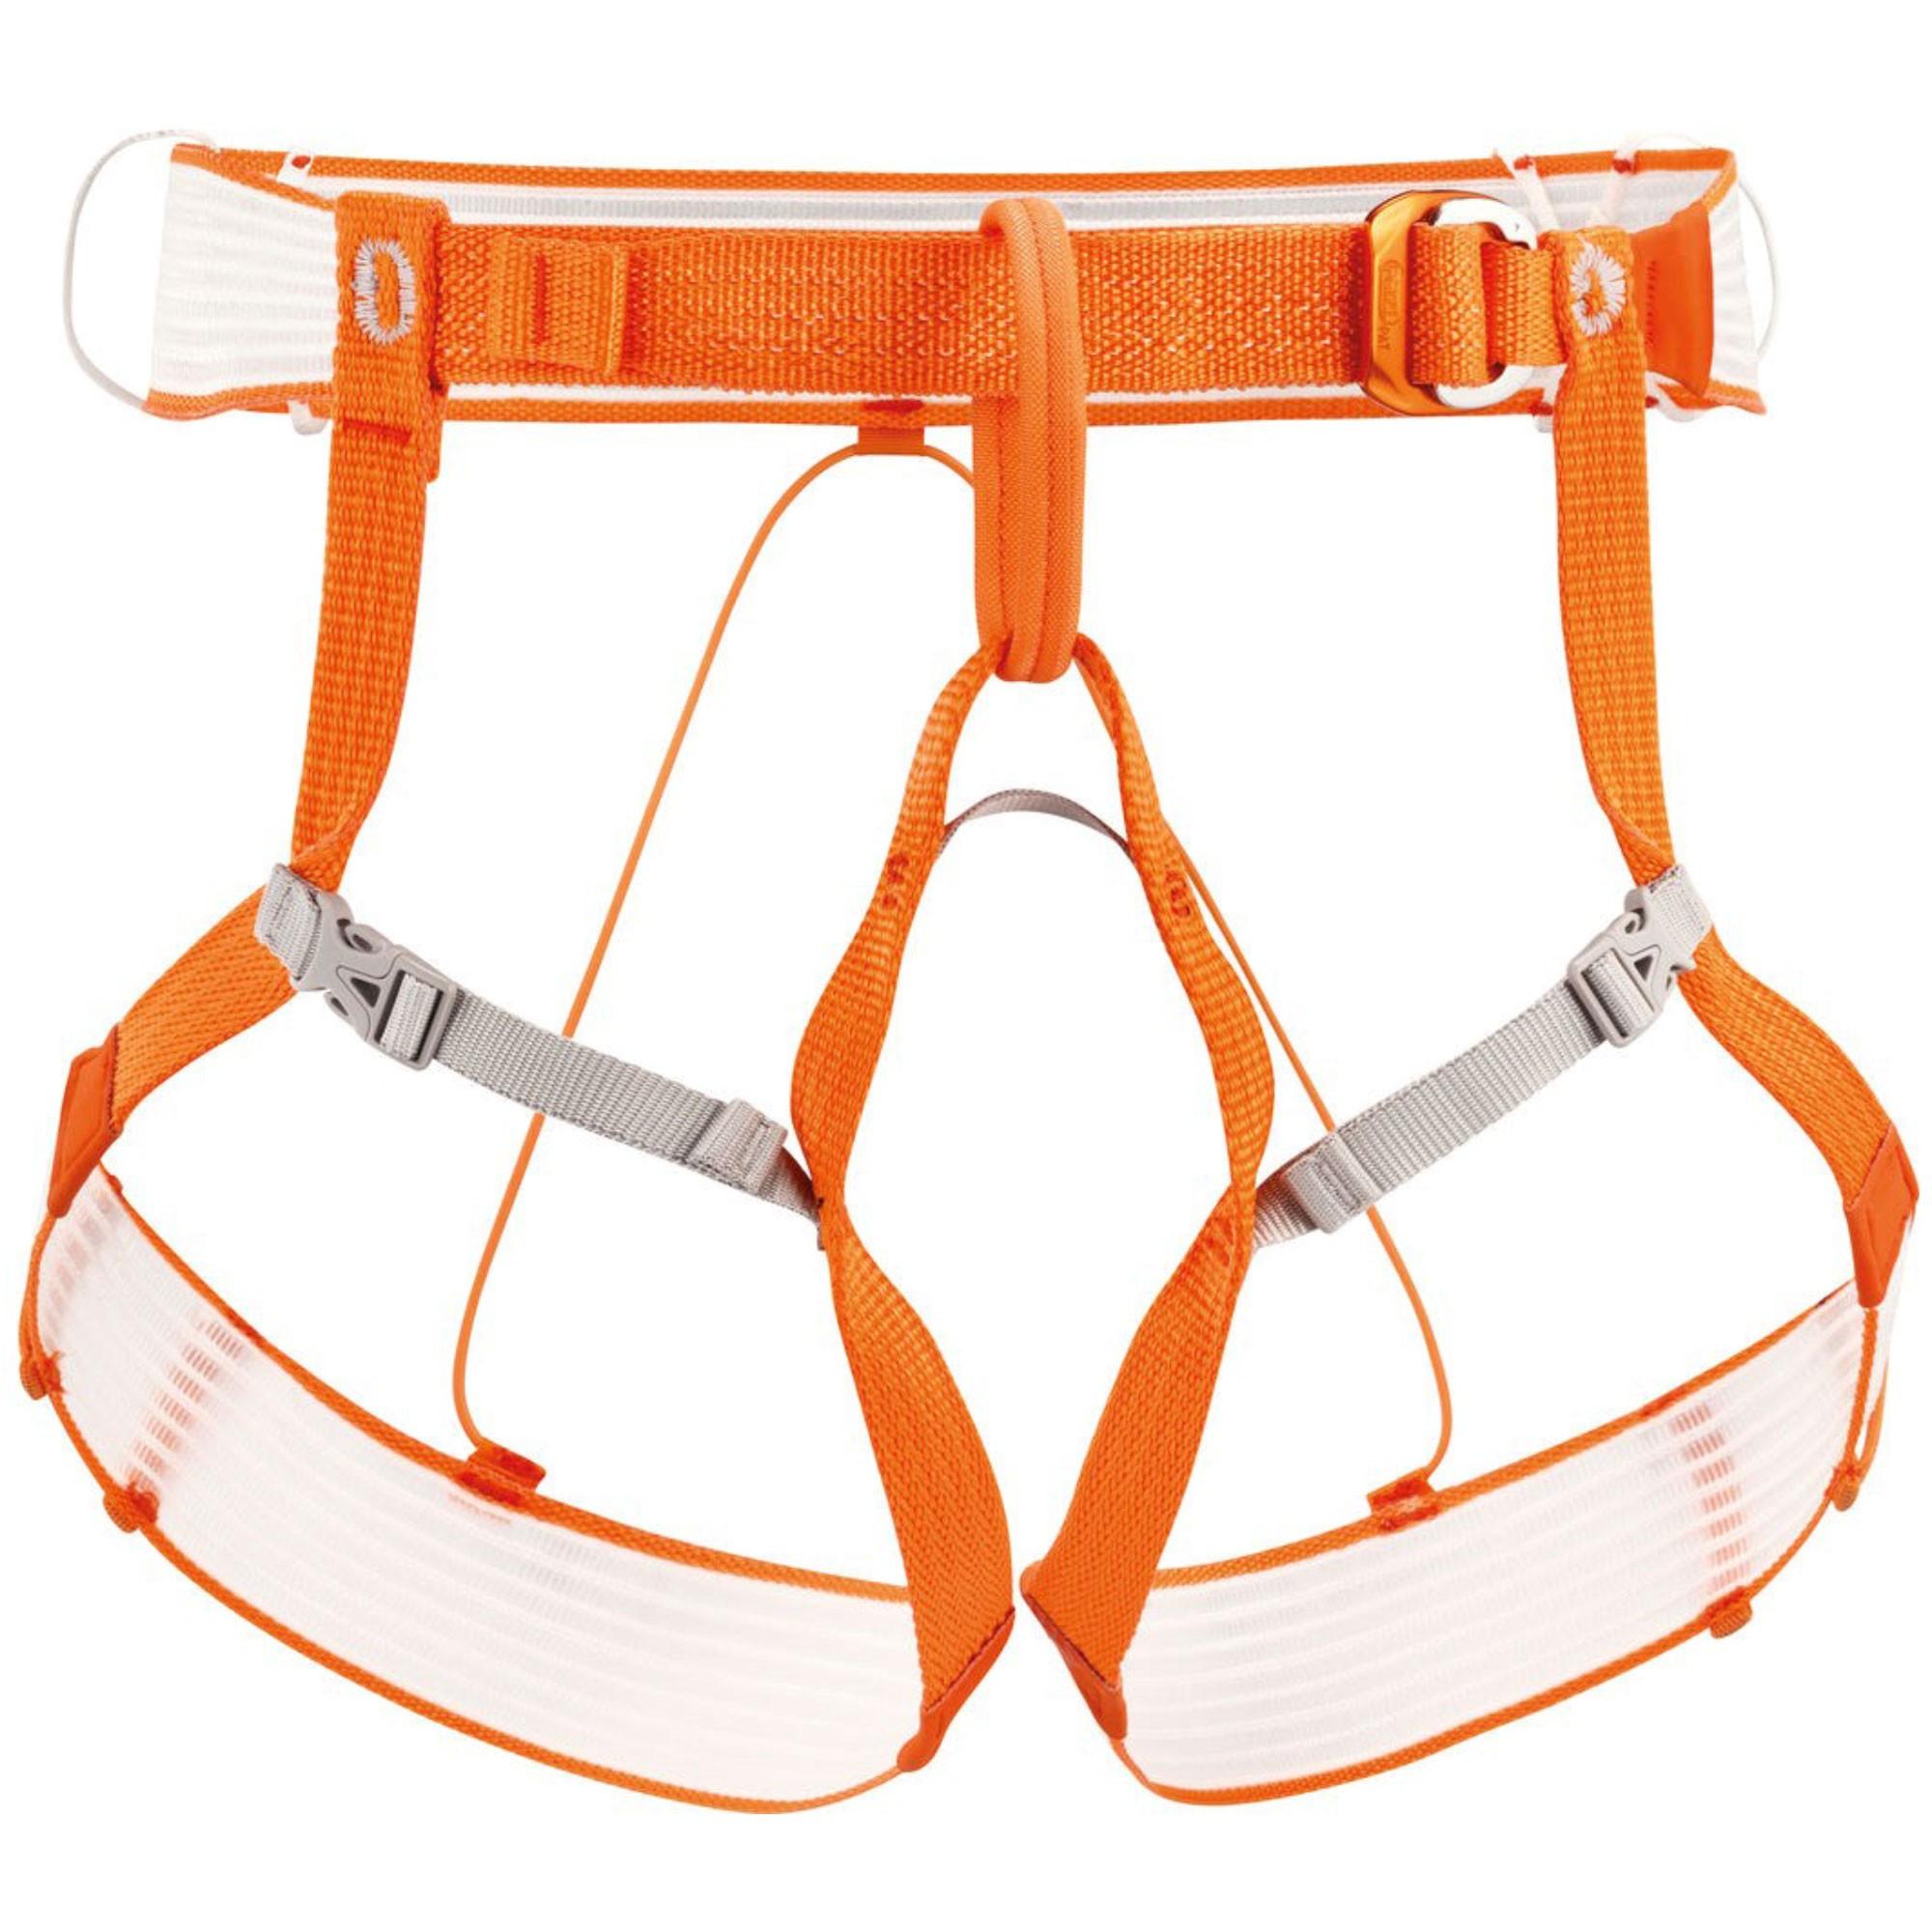 PETZL - Altitude Mountaineering Harness